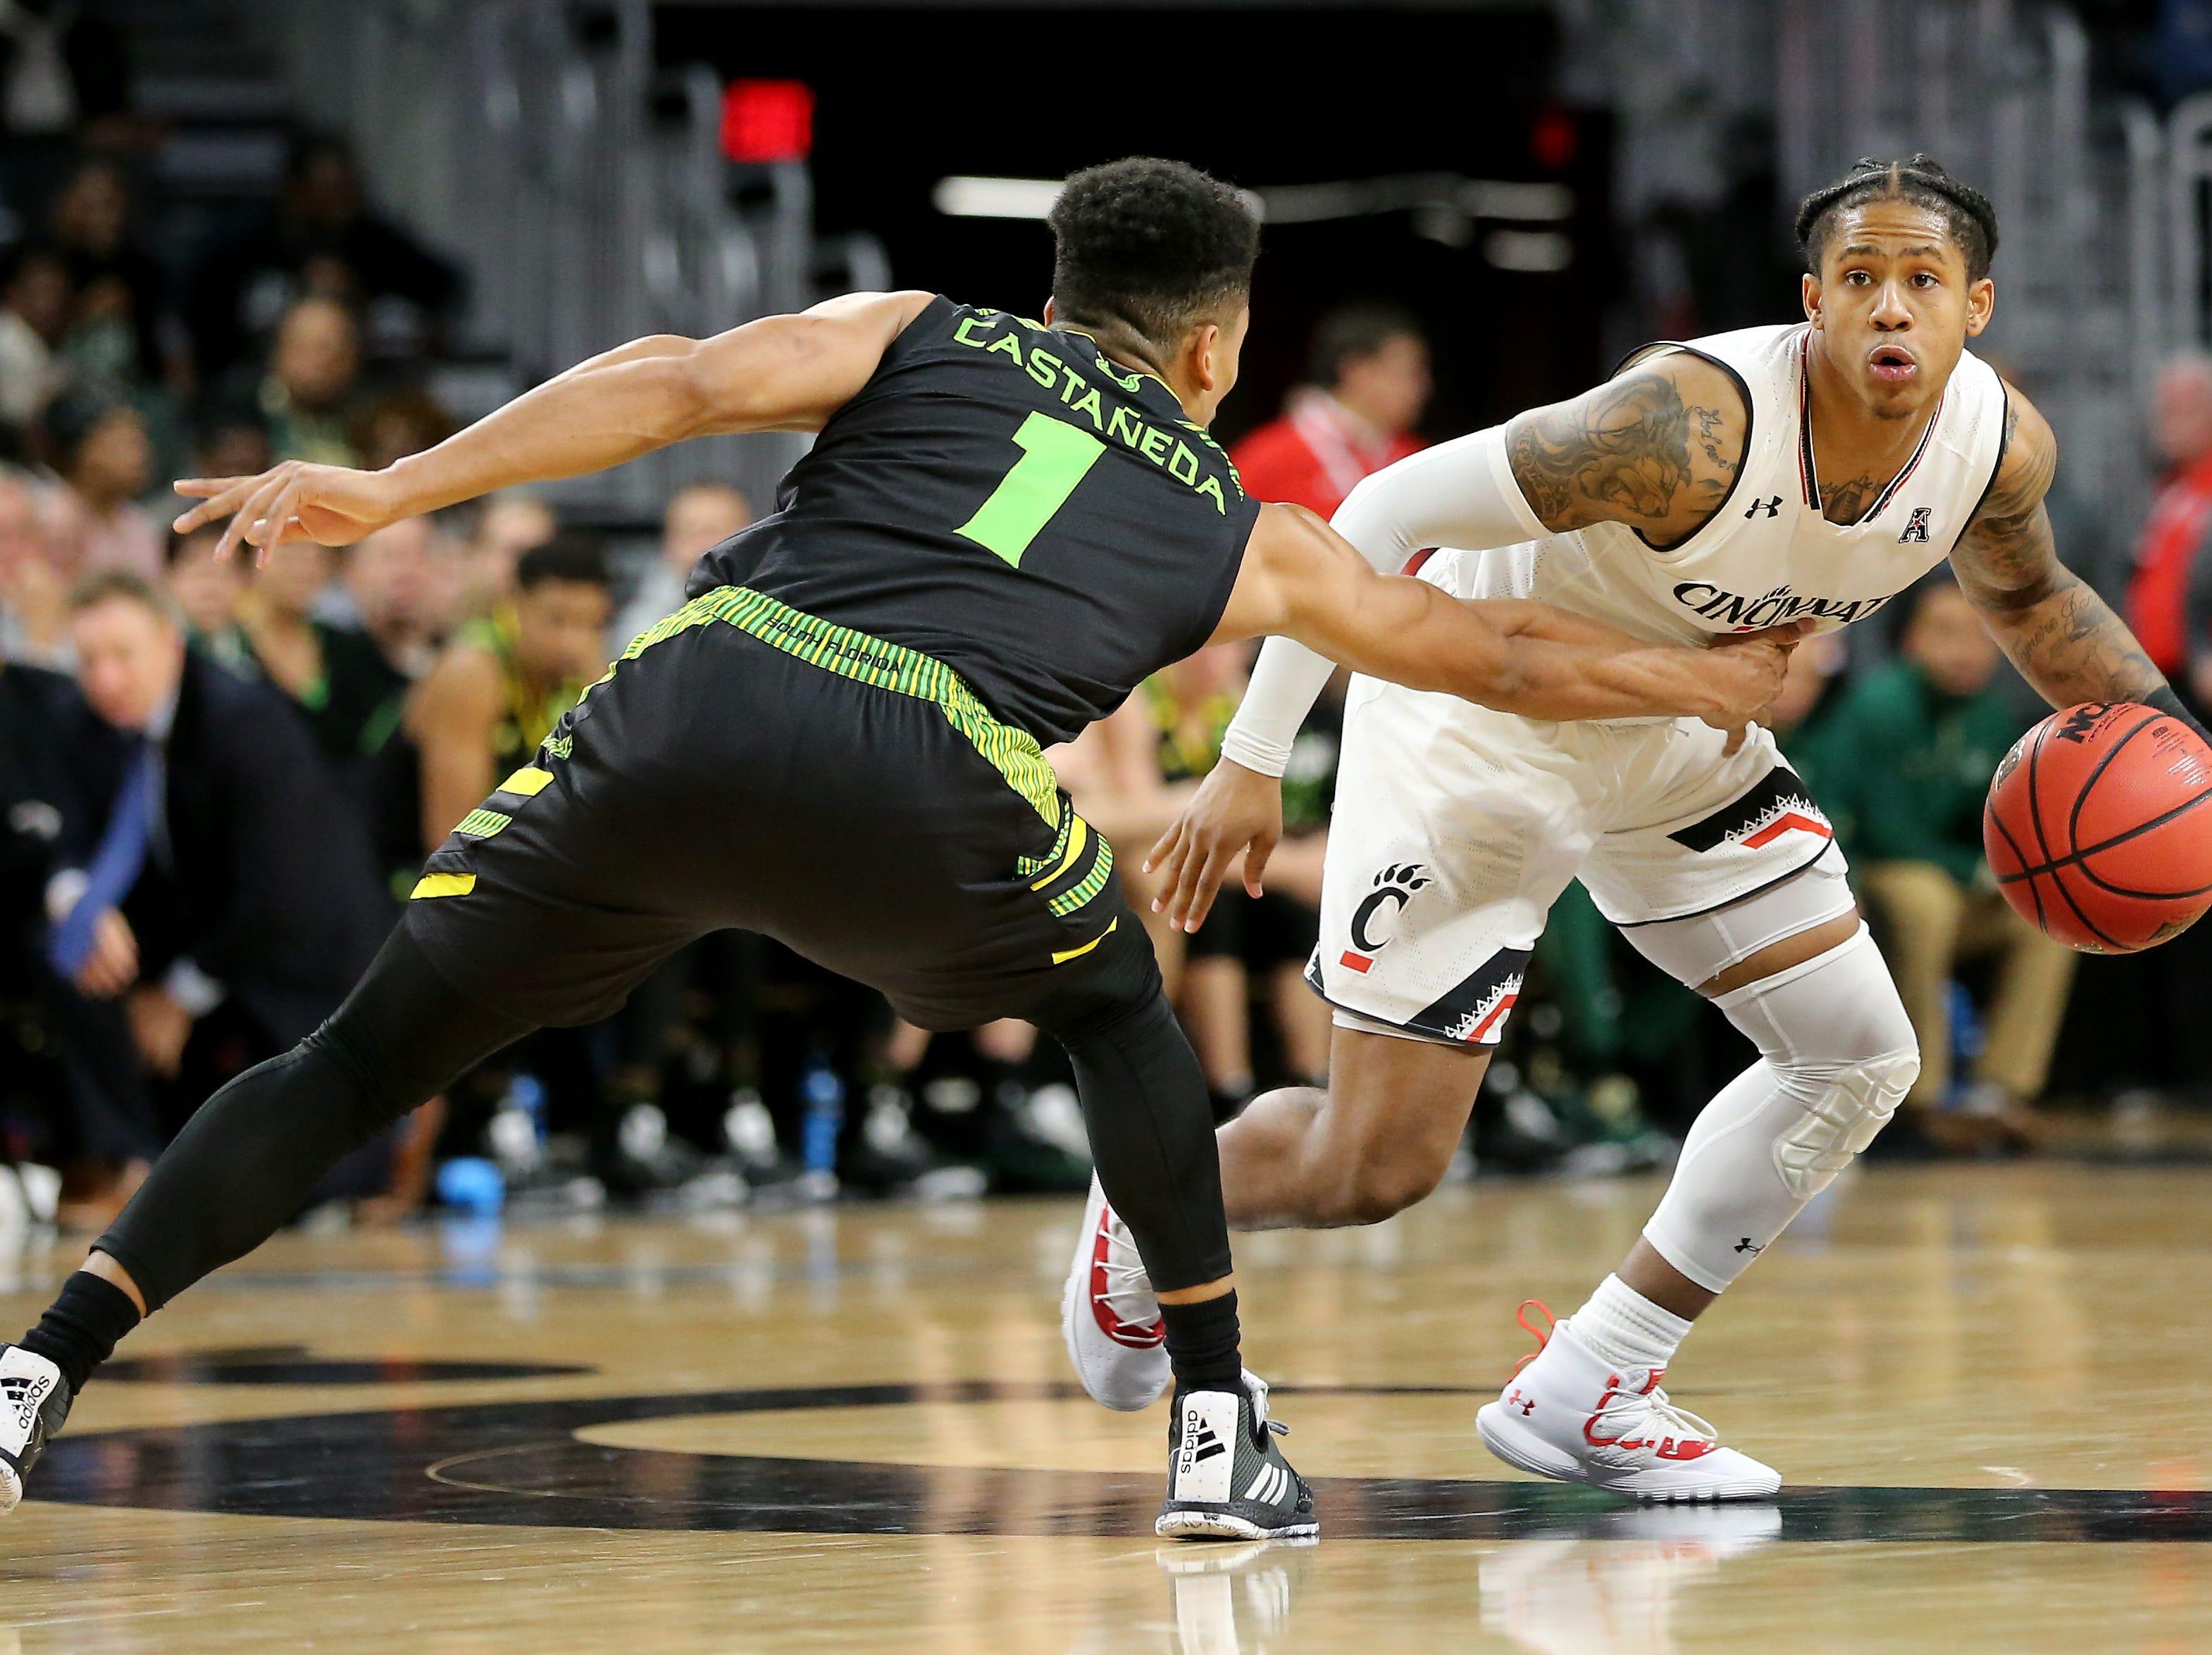 Cincinnati Bearcats guard Justin Jenifer (3) brings the ball up court as South Florida Bulls guard Xavier Castaneda (1) defends in the second half of an NCAA college basketball game, Tuesday, Jan. 15, 2019, at Fifth Third Arena in Cincinnati. Cincinnati won 82-74.